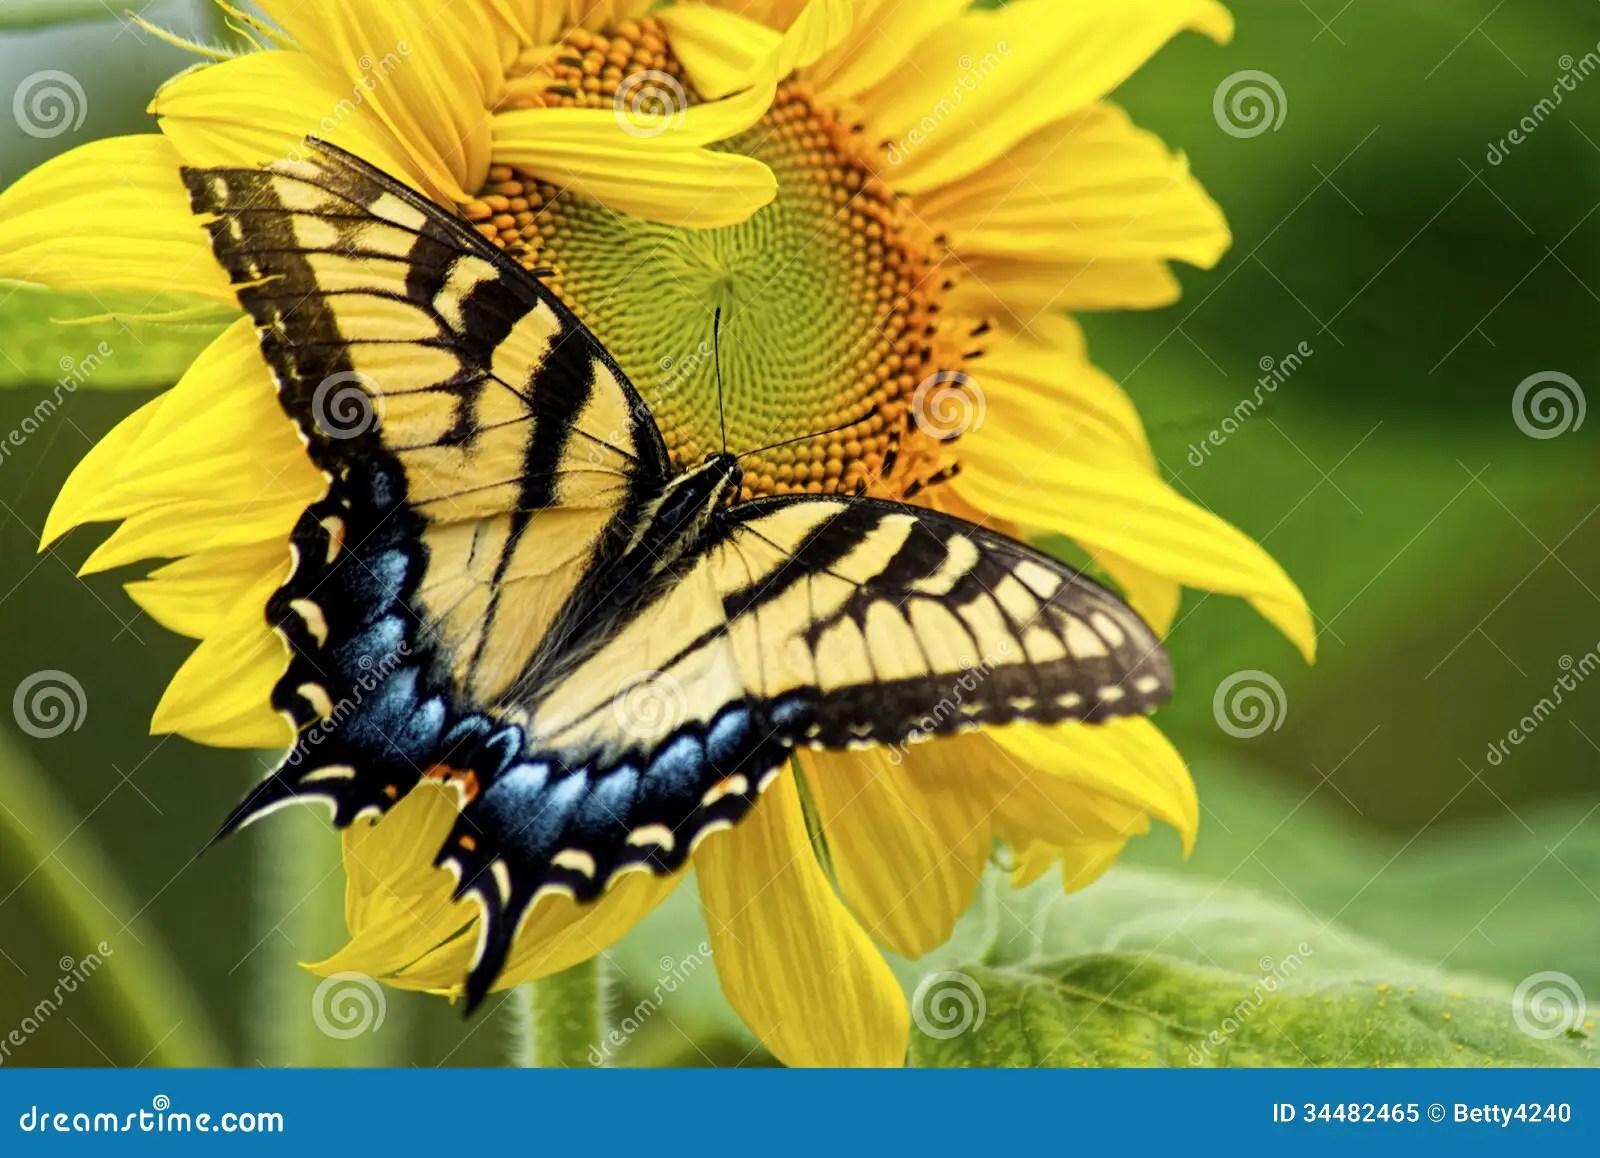 3d Sunflower Wallpaper Eastern Swallowtail Butterfly Works On A Yellow Sunflower